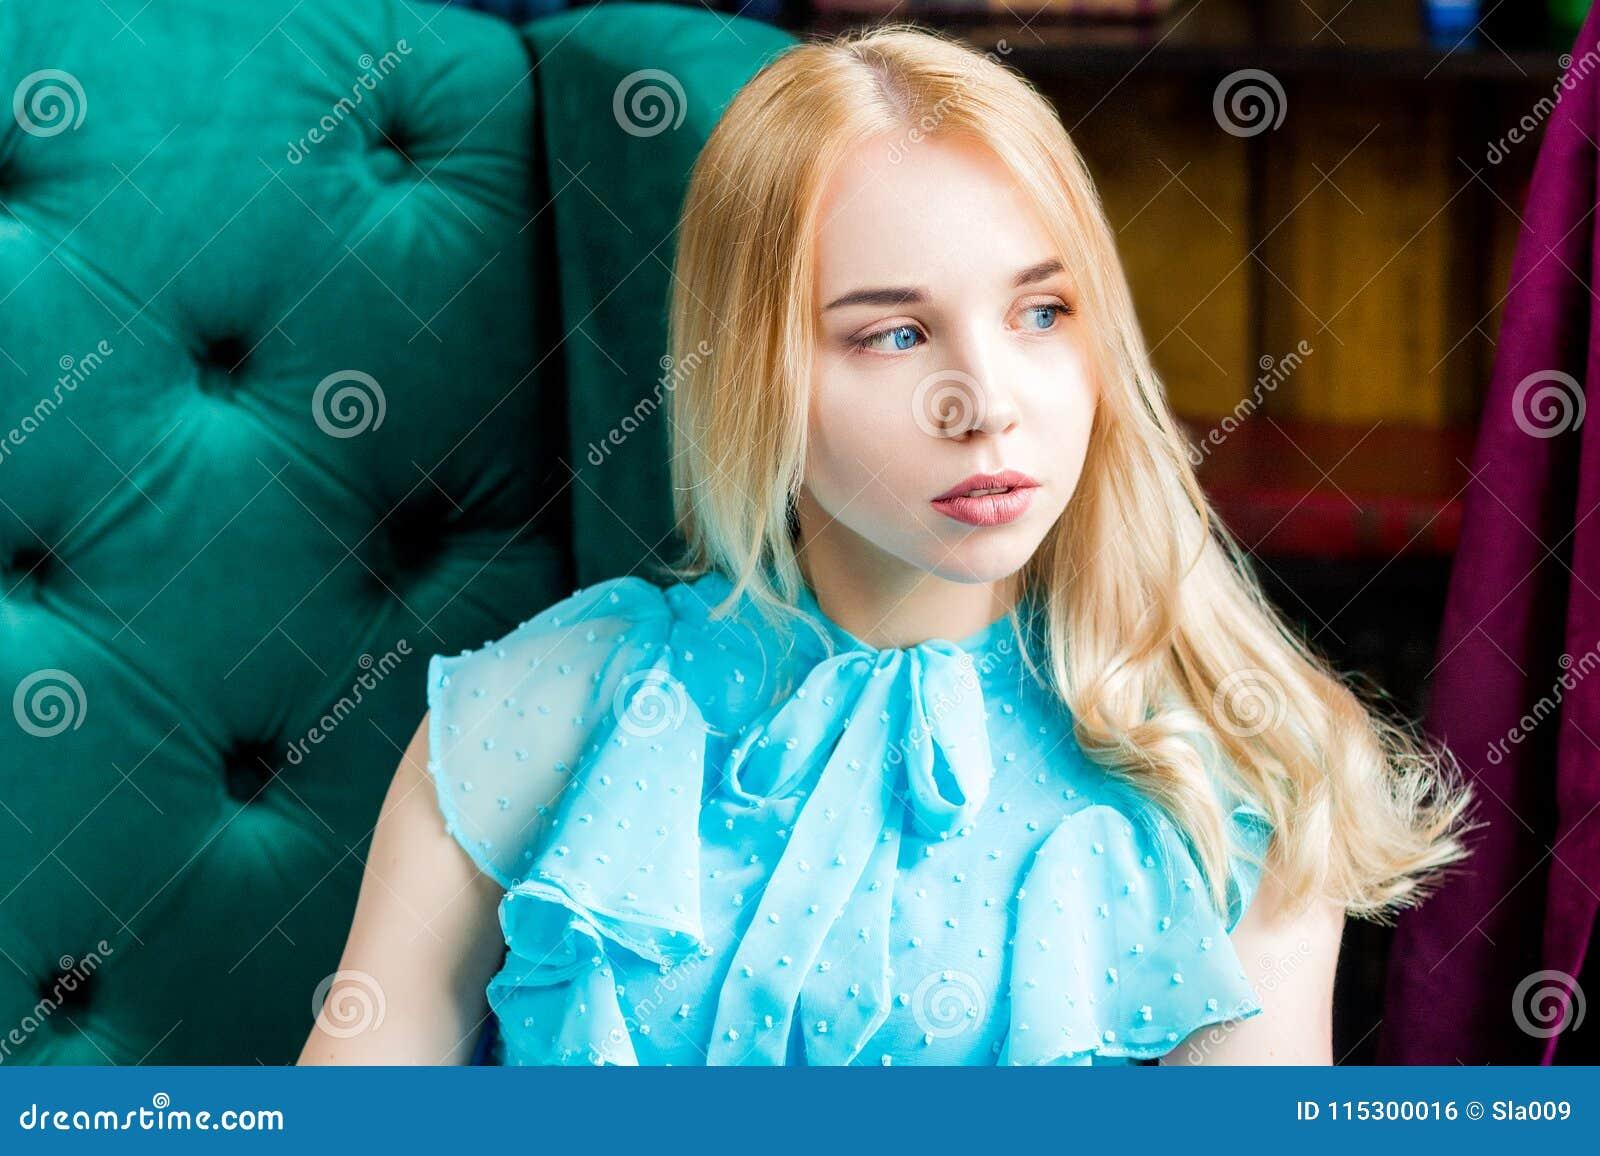 Негритянские фото красотка девушка на стуле стриптиз постели